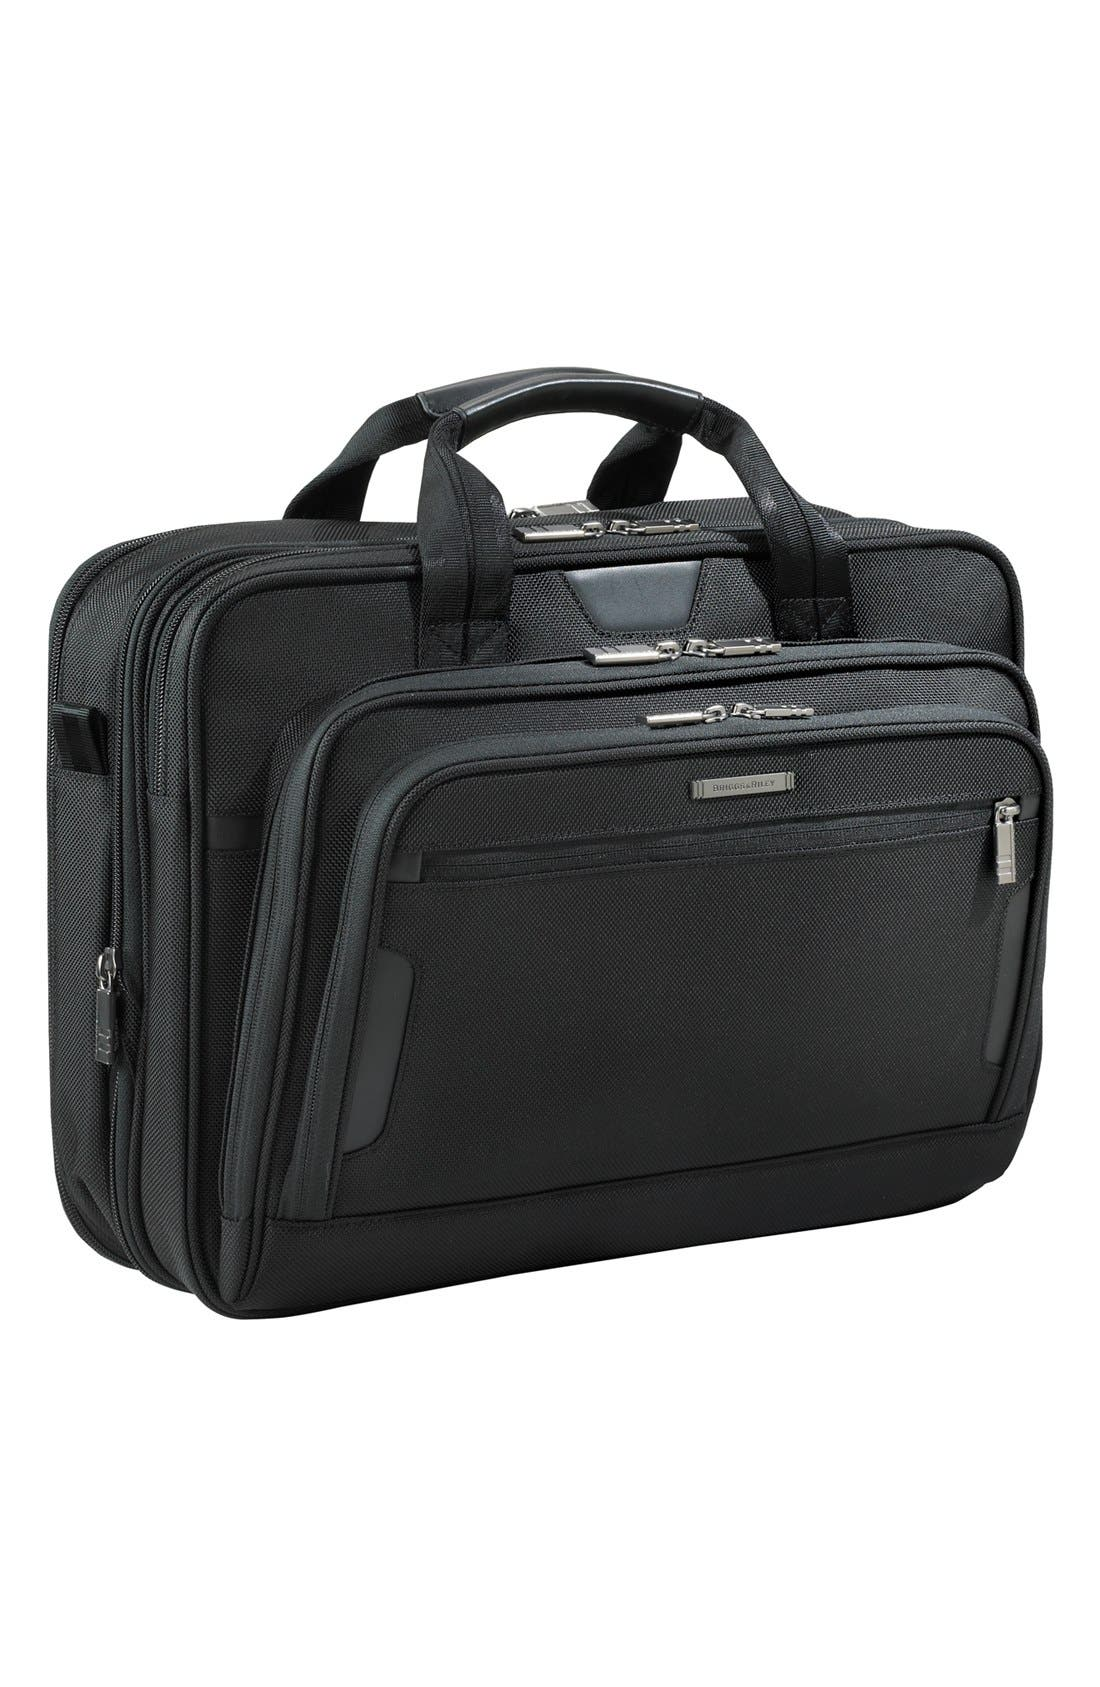 Briggs & Riley 'Medium' Expandable Ballistic Nylon Briefcase